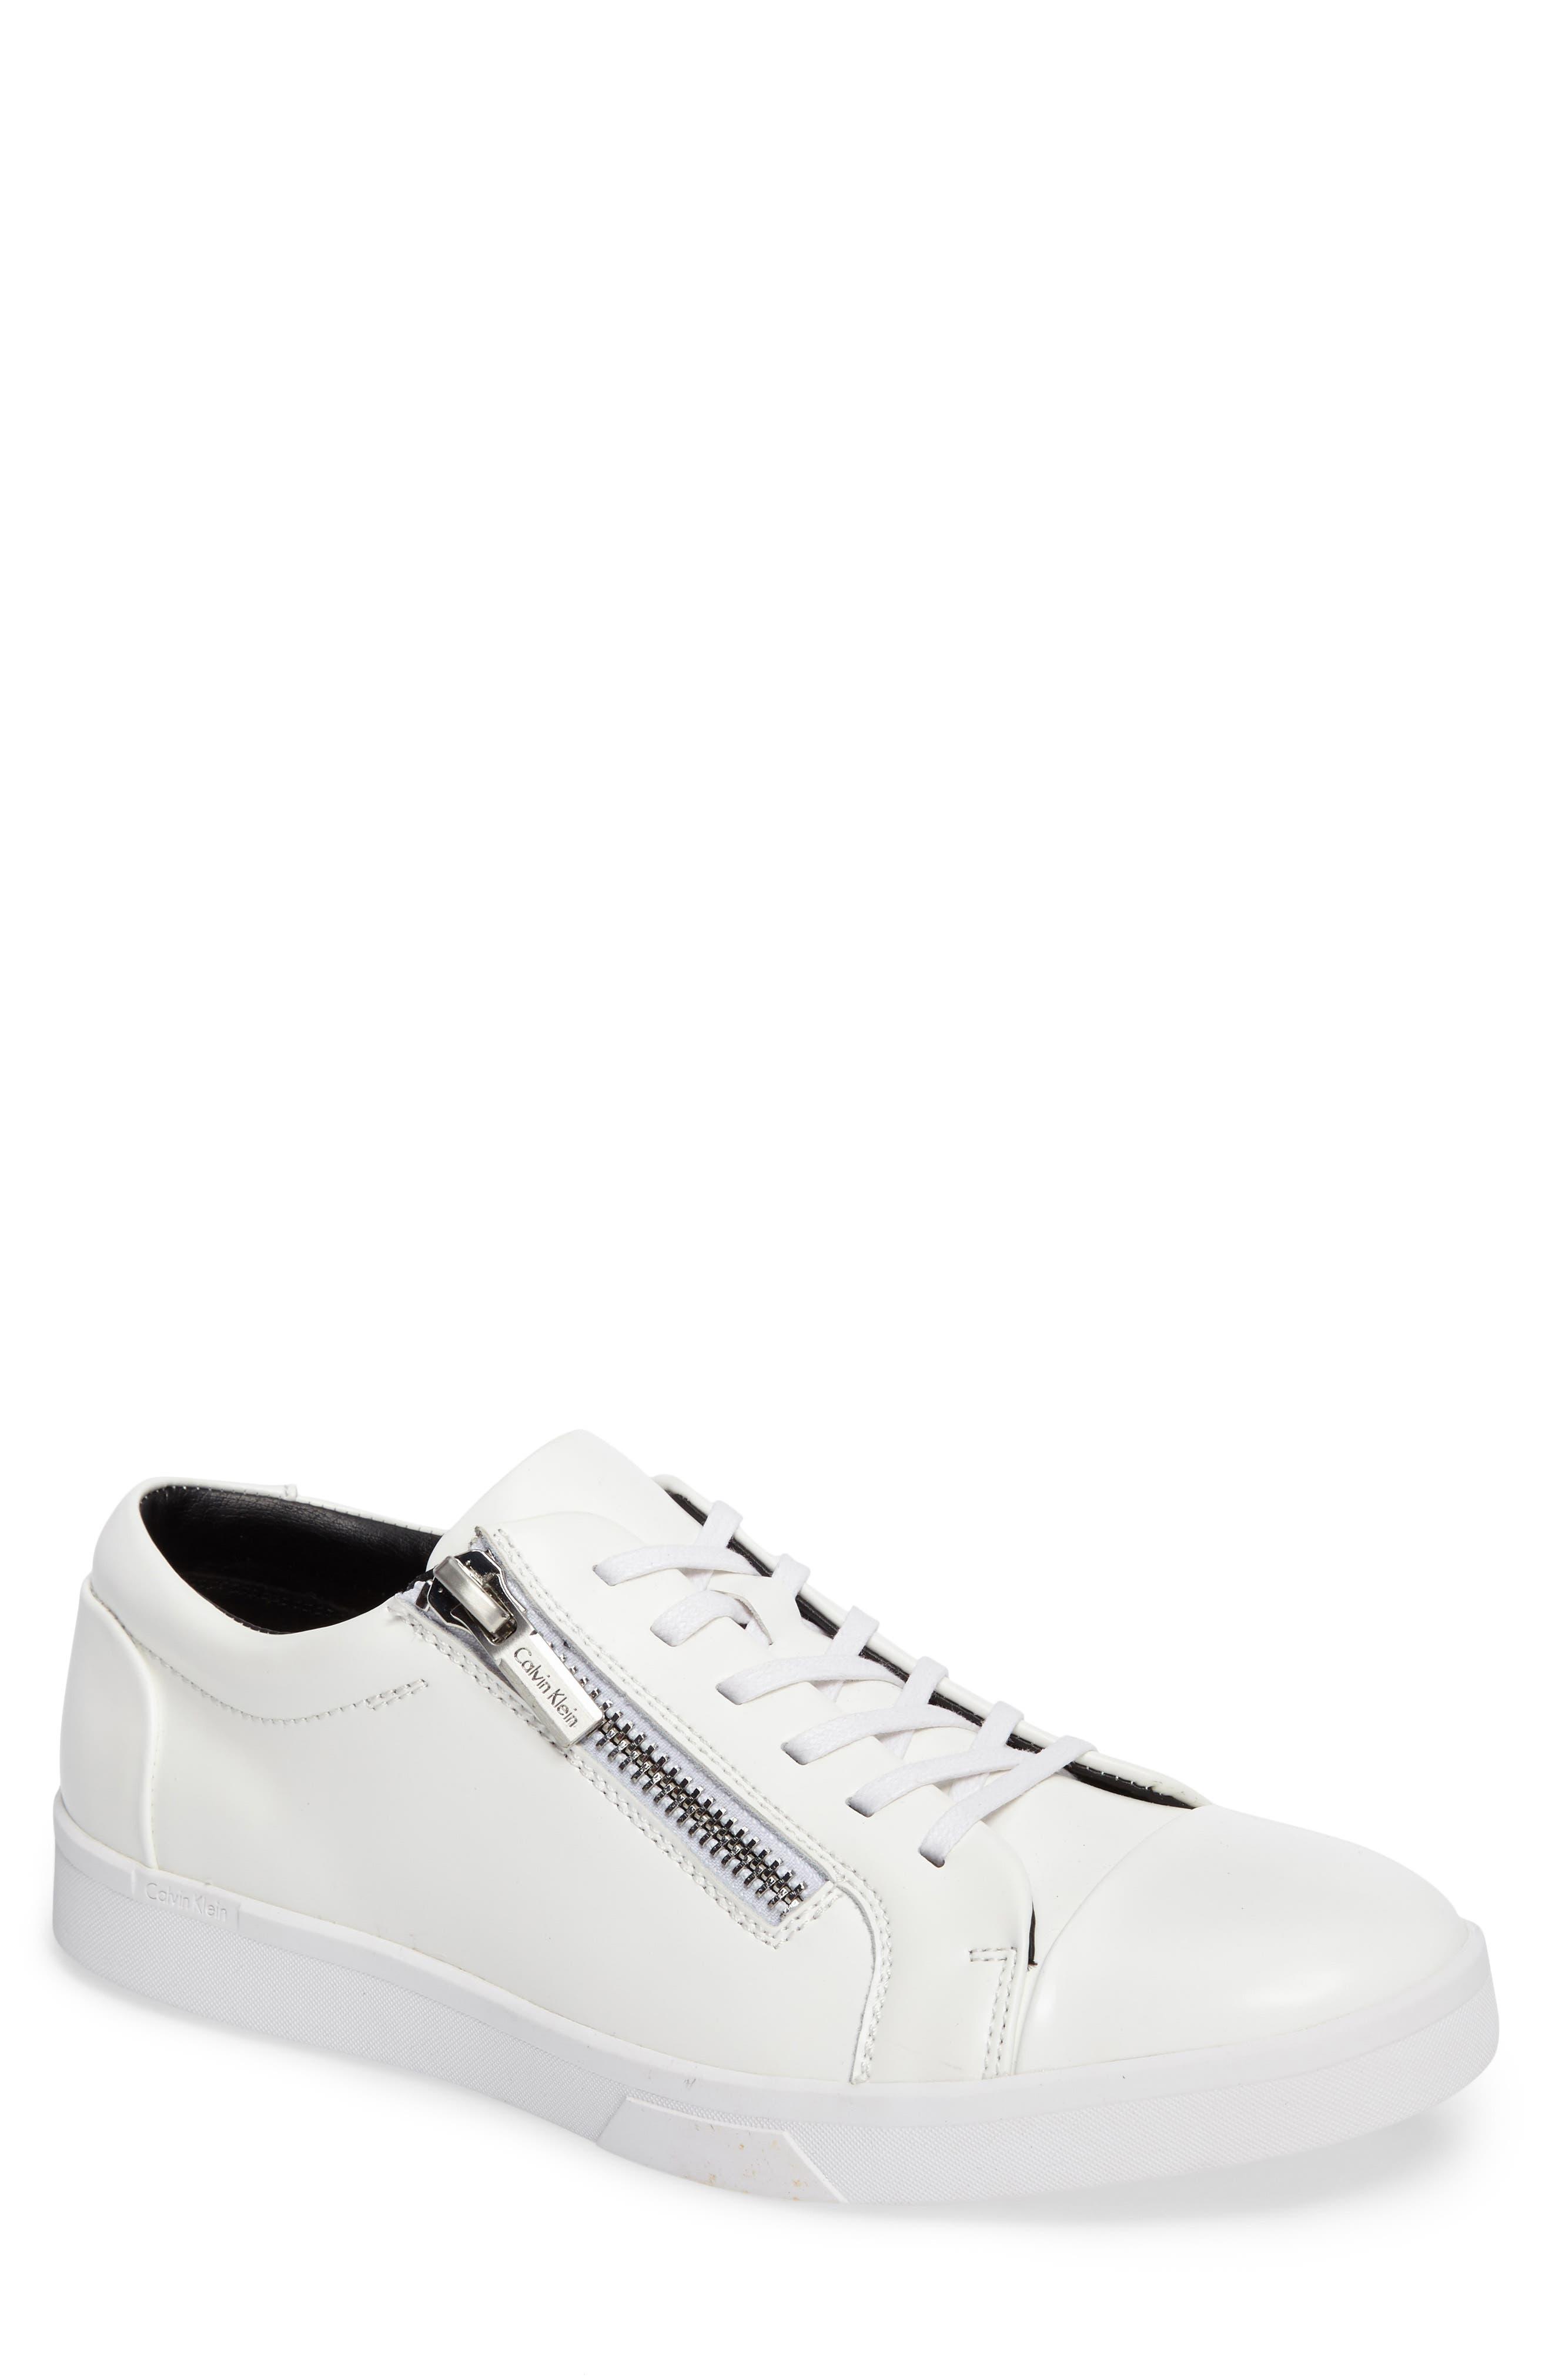 Ibrahim Cap-Toe Zip Sneaker,                             Main thumbnail 2, color,